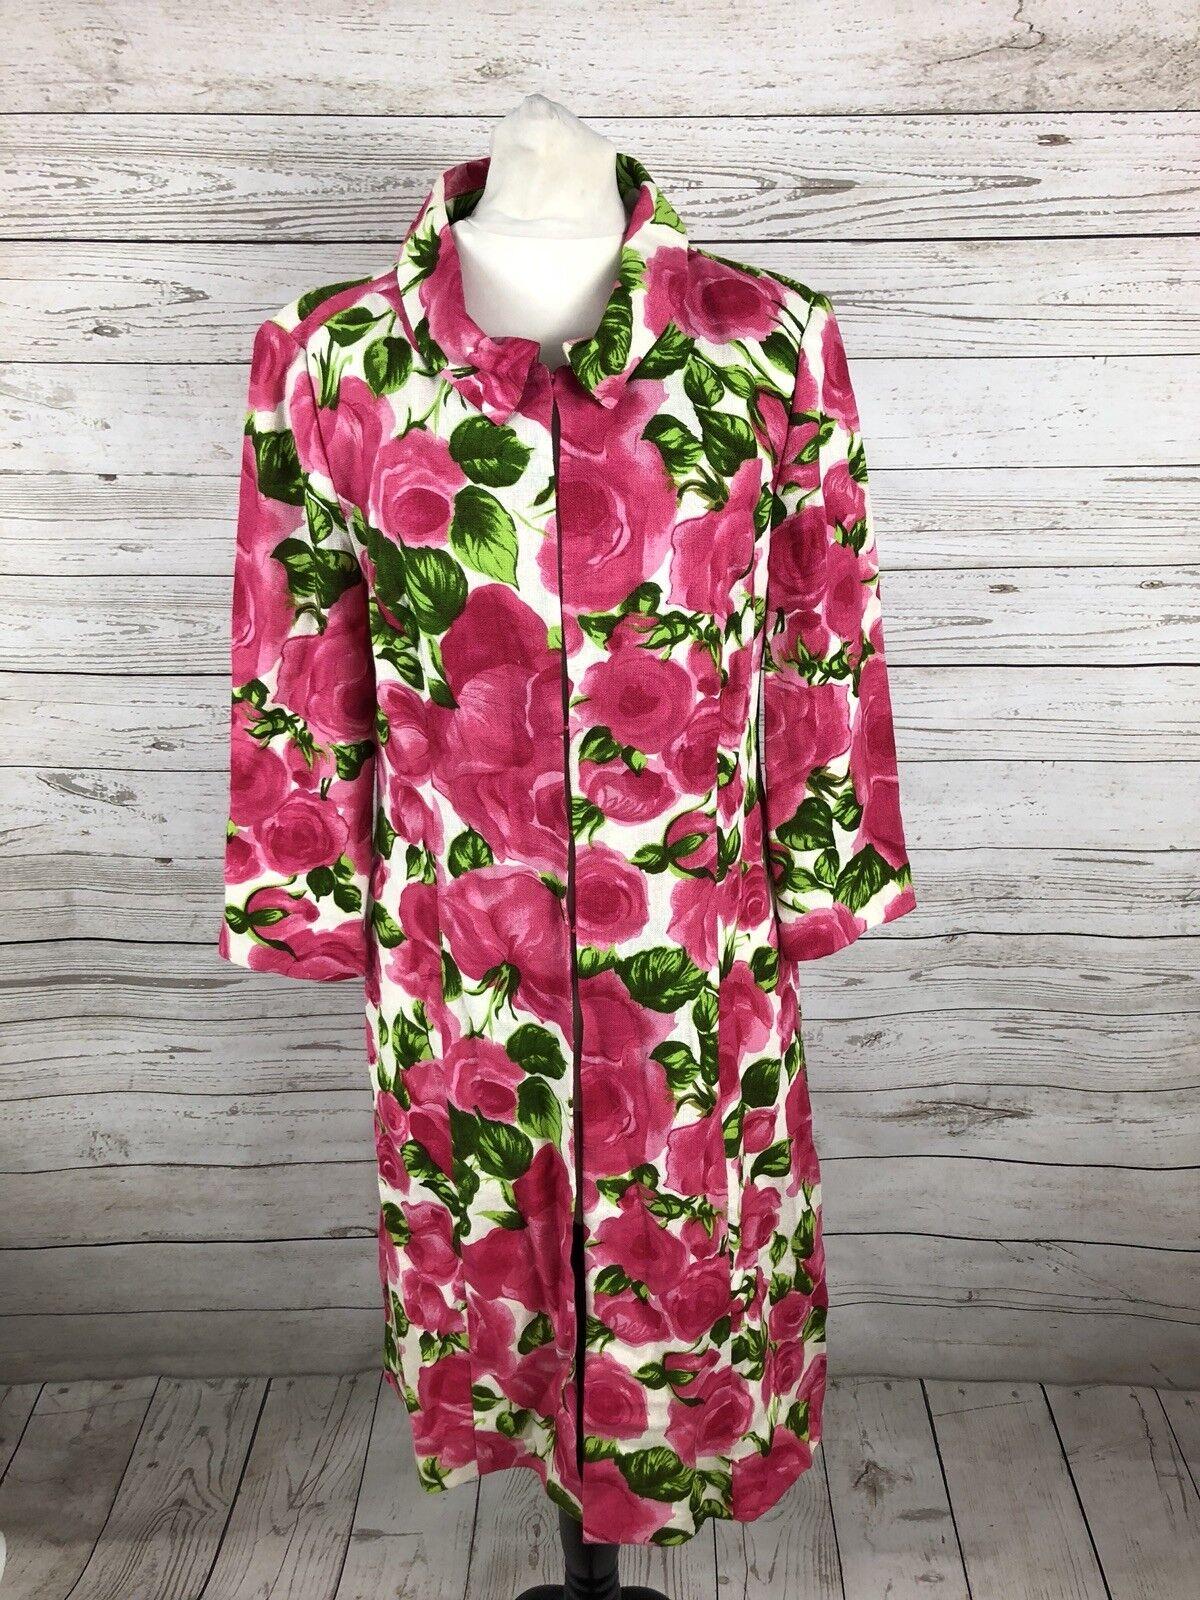 PHASE EIGHT Long Floral Linen Coat - - - Small - Great Condition - damen's   Neuer Stil    Hochwertig    Shop Düsseldorf  628f17